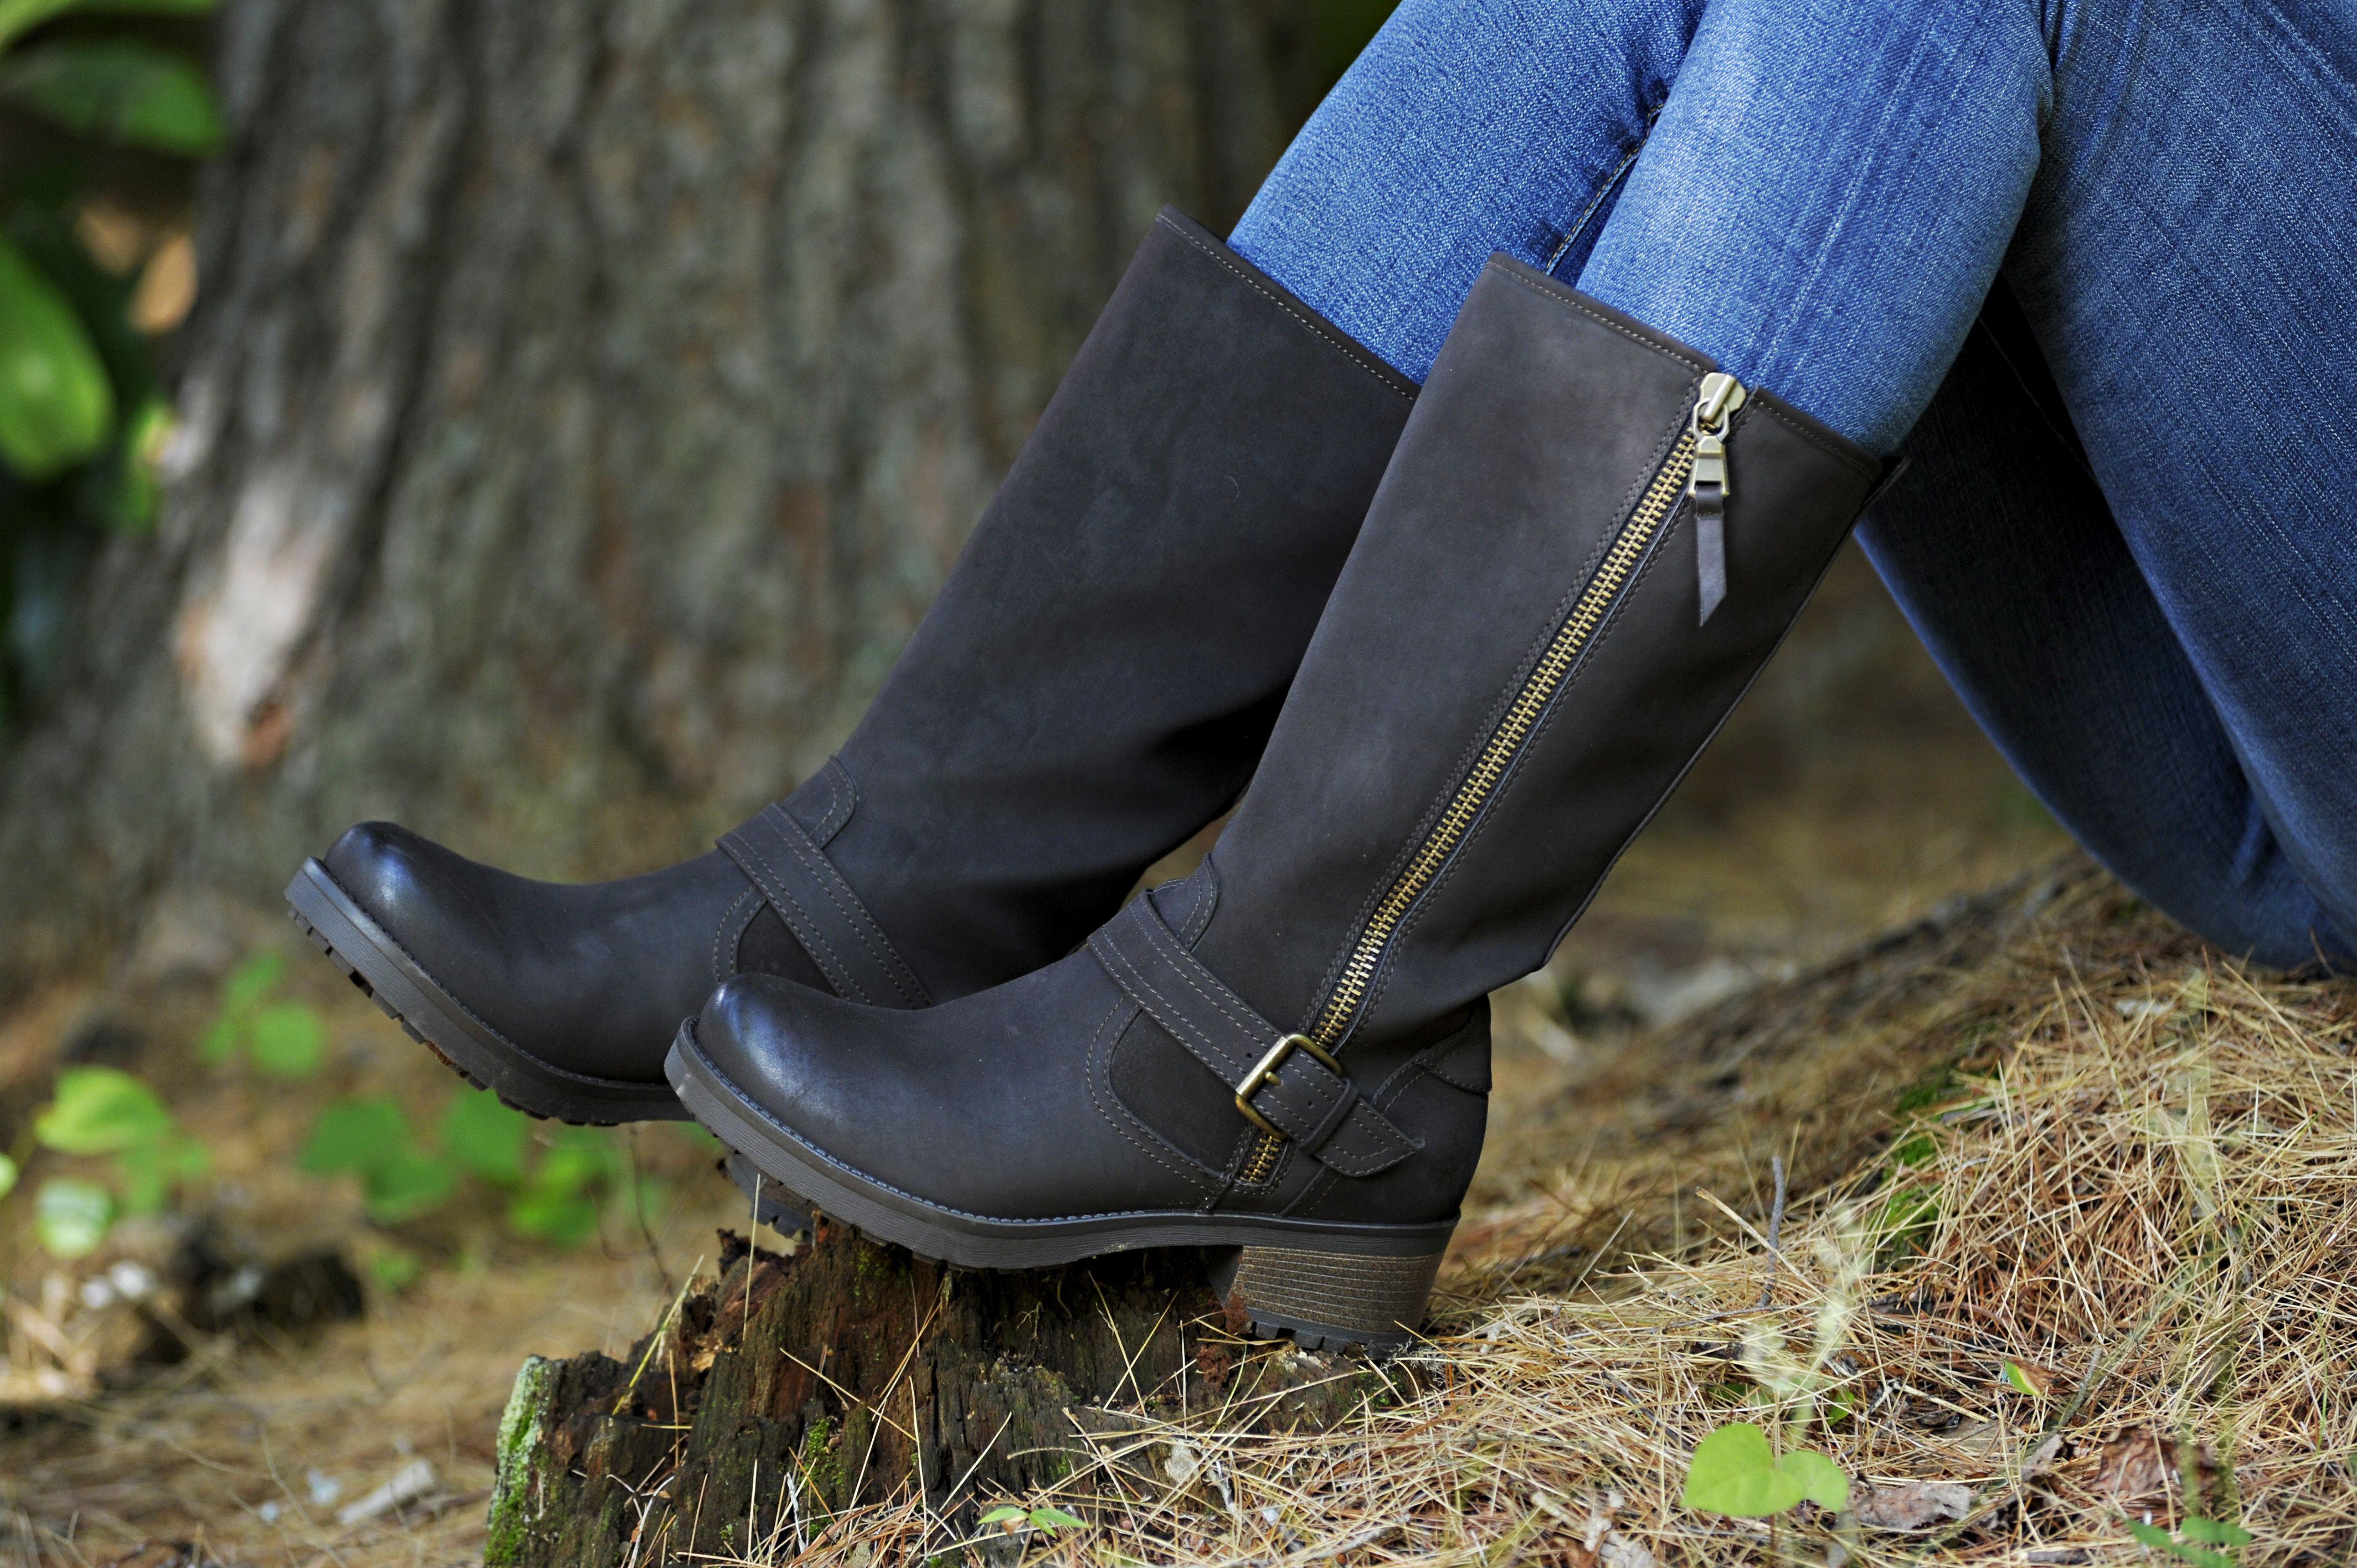 White Mountain Backbeat boot in black